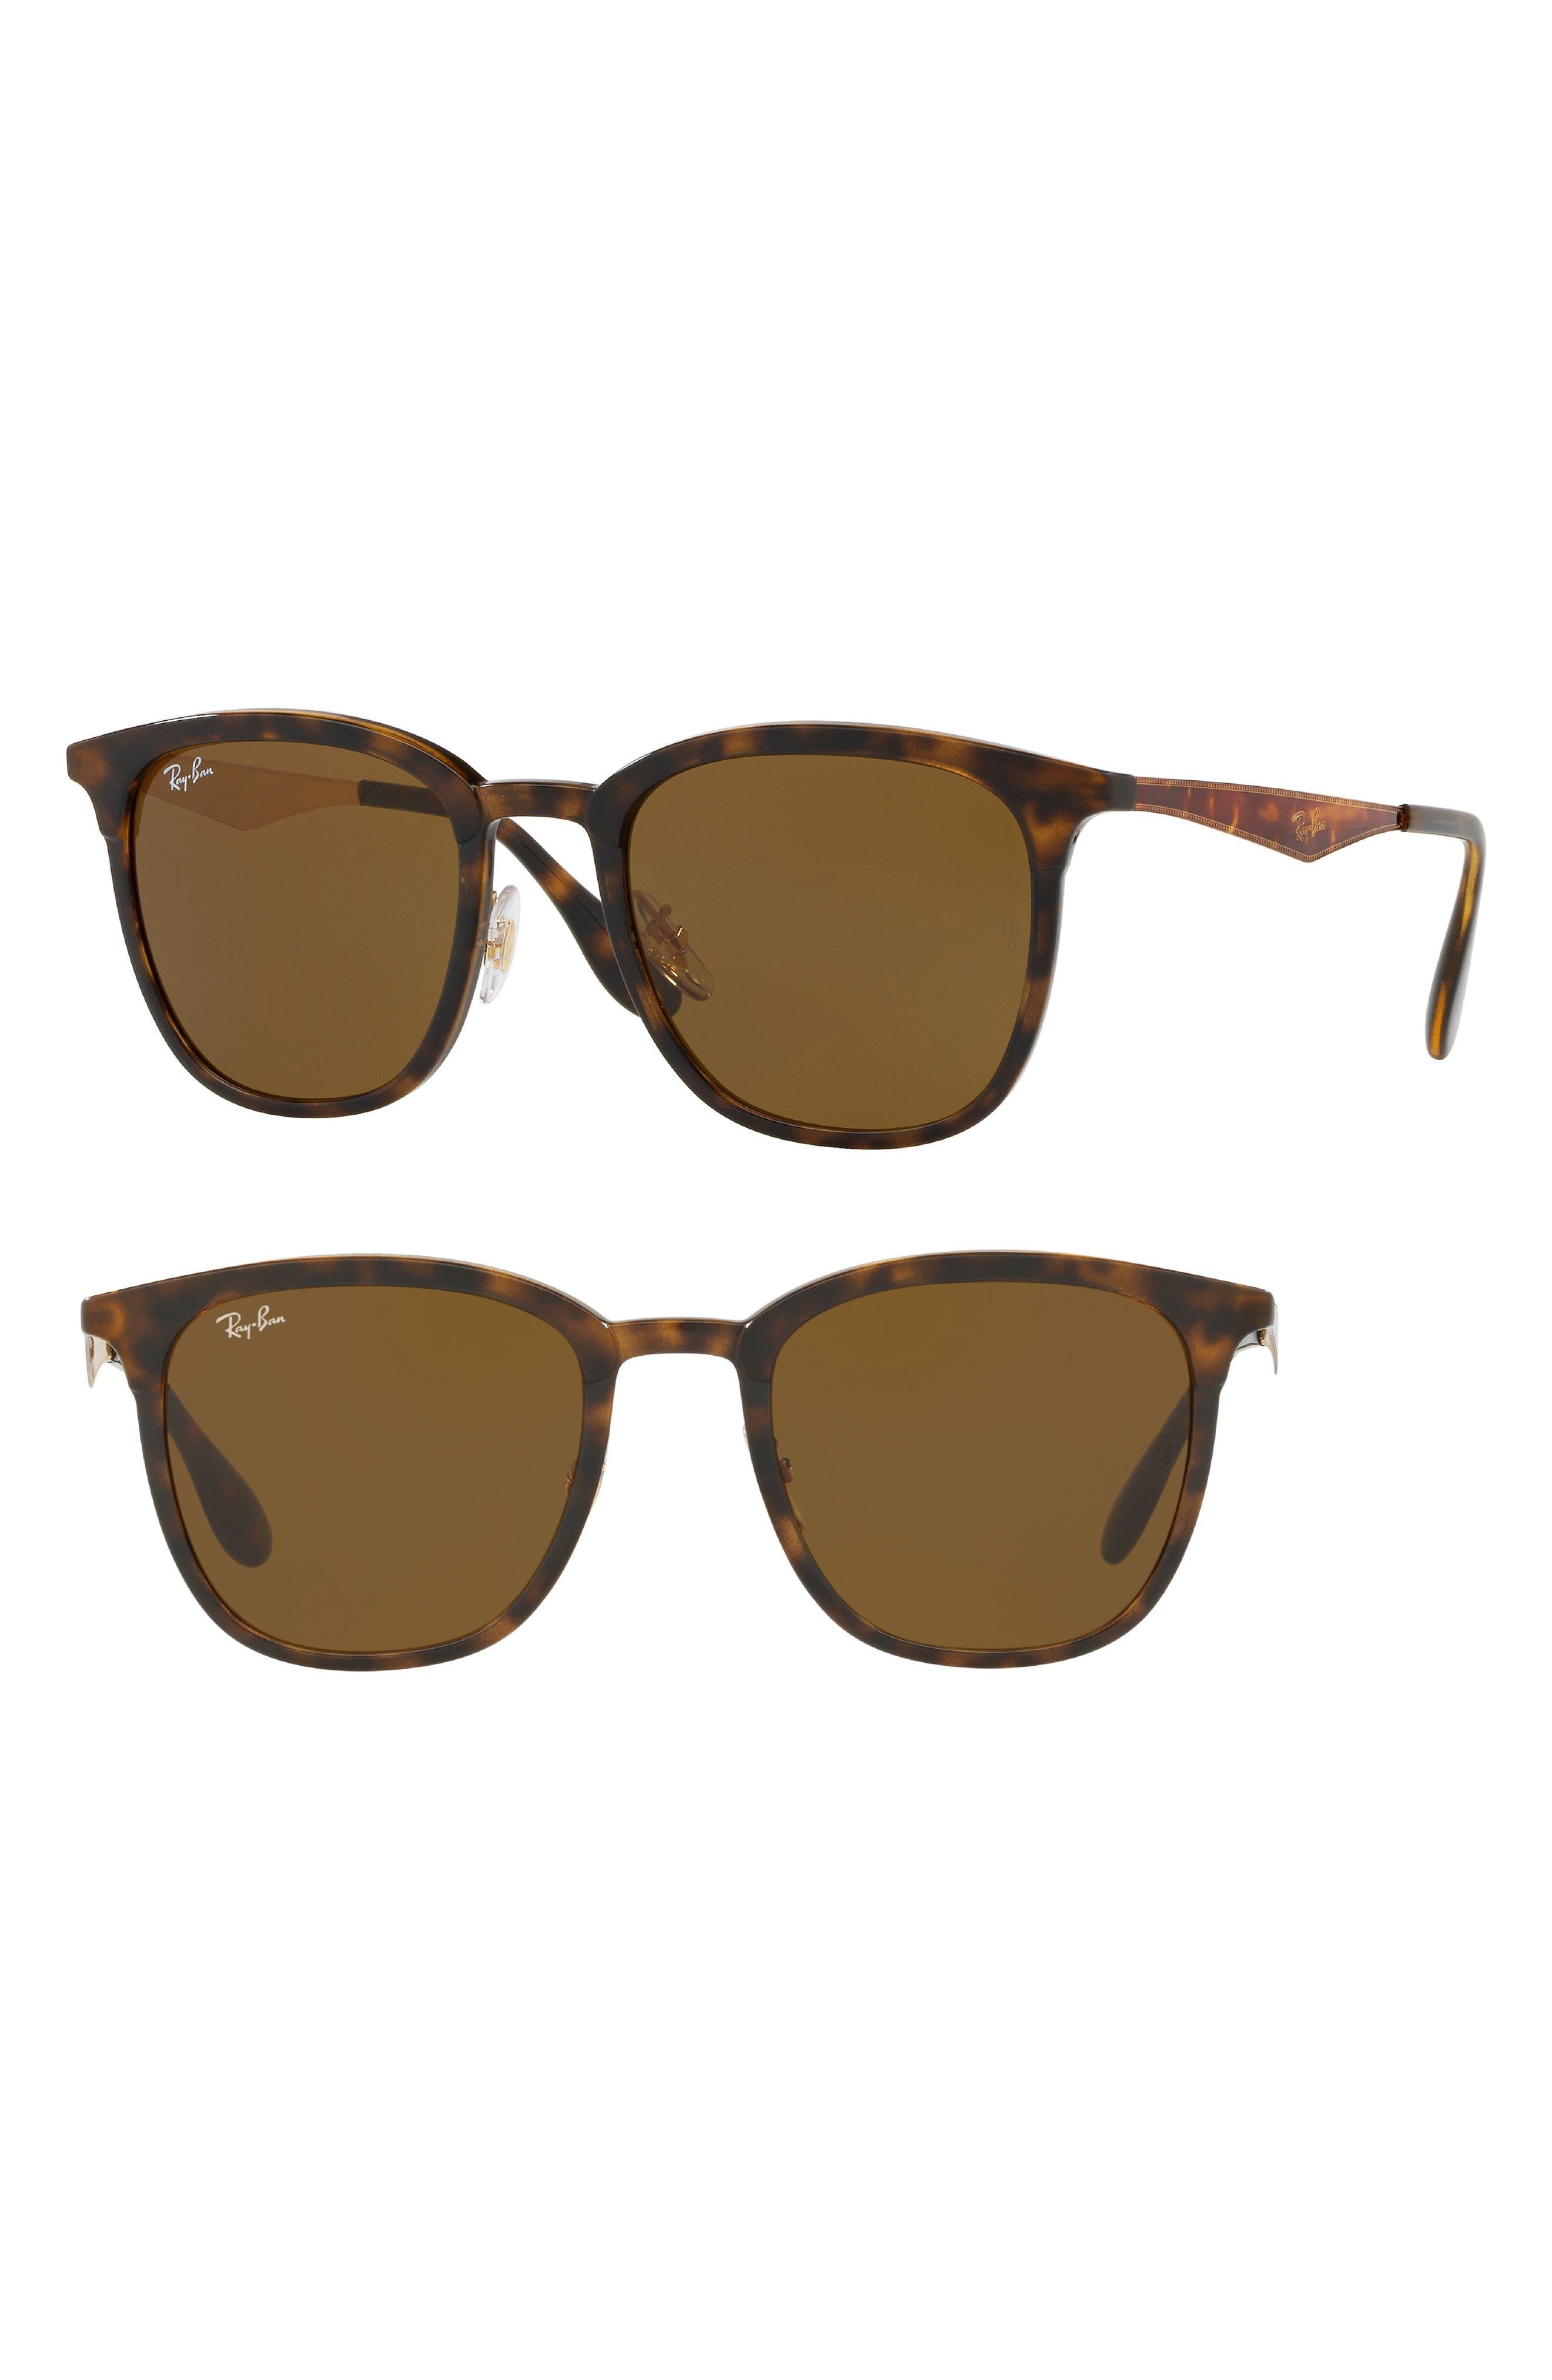 Highstreet 51mm Square Sunglasses,                             Main thumbnail 1, color,                             HAVANA